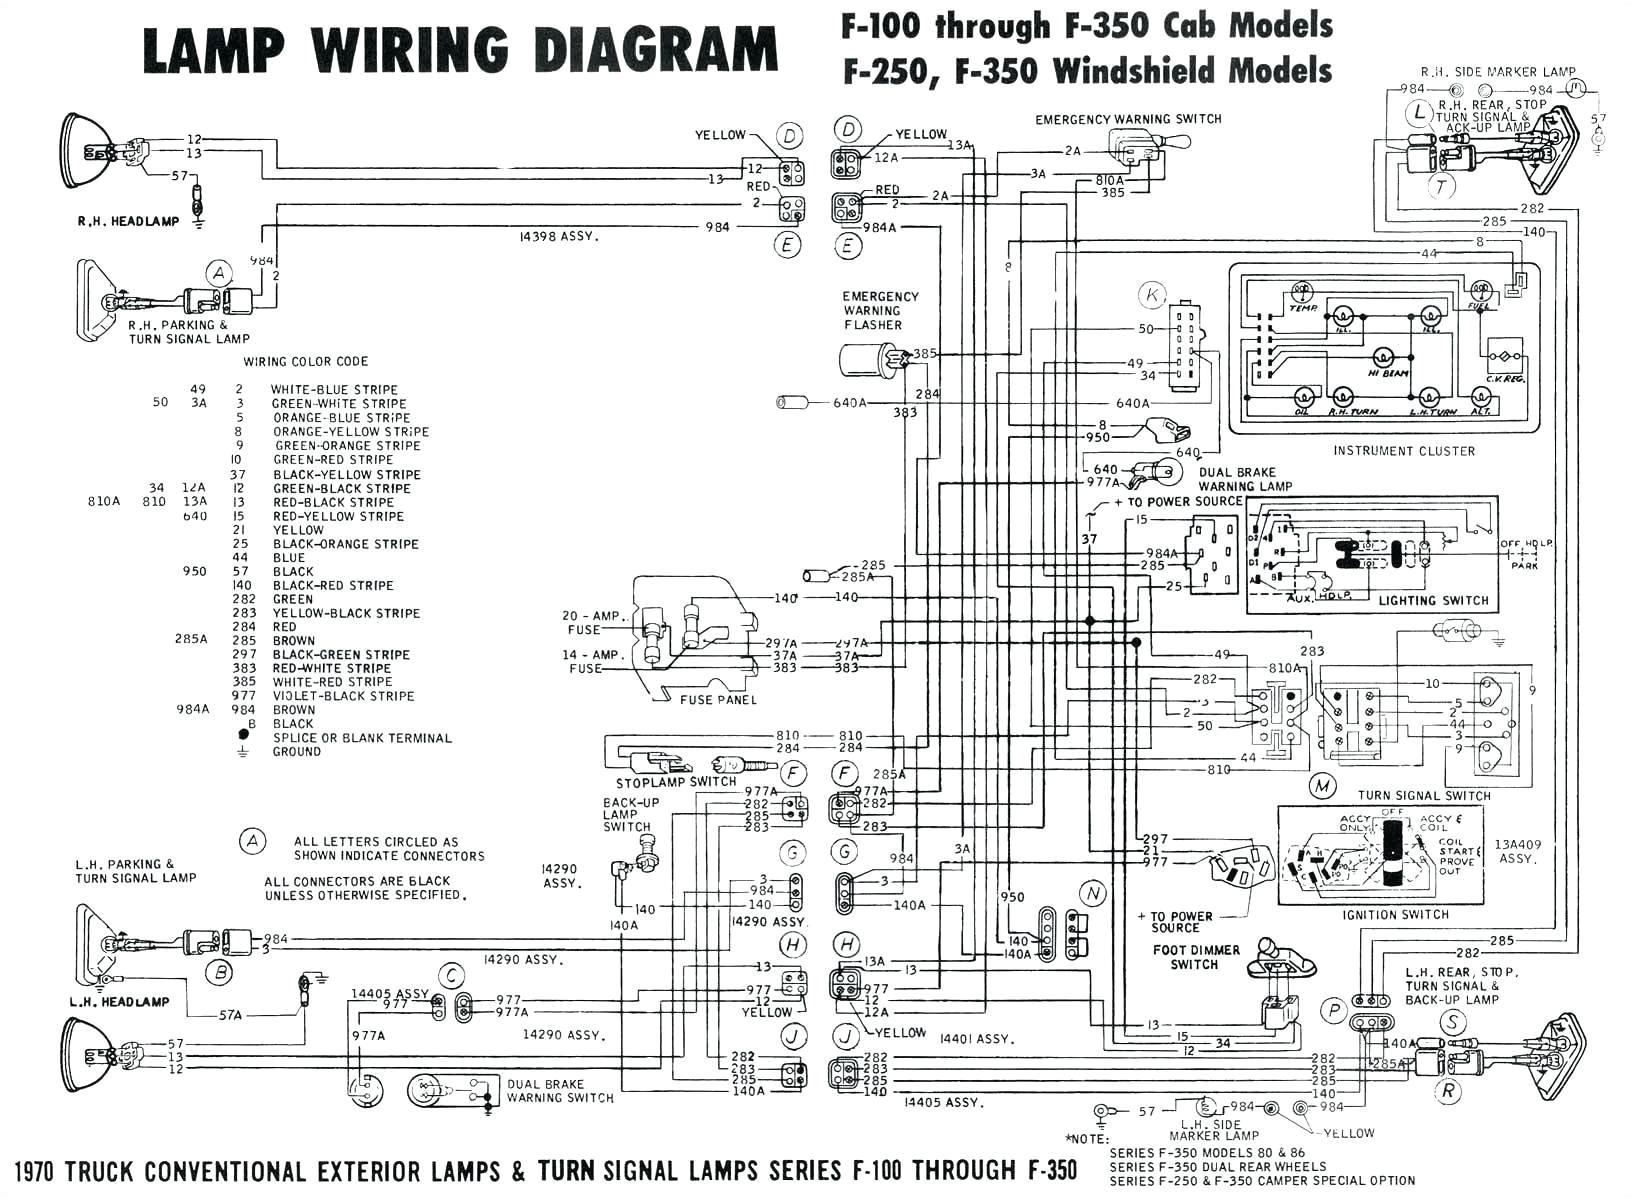 cj3 wiring diagram manual e book cj3 wiring diagram